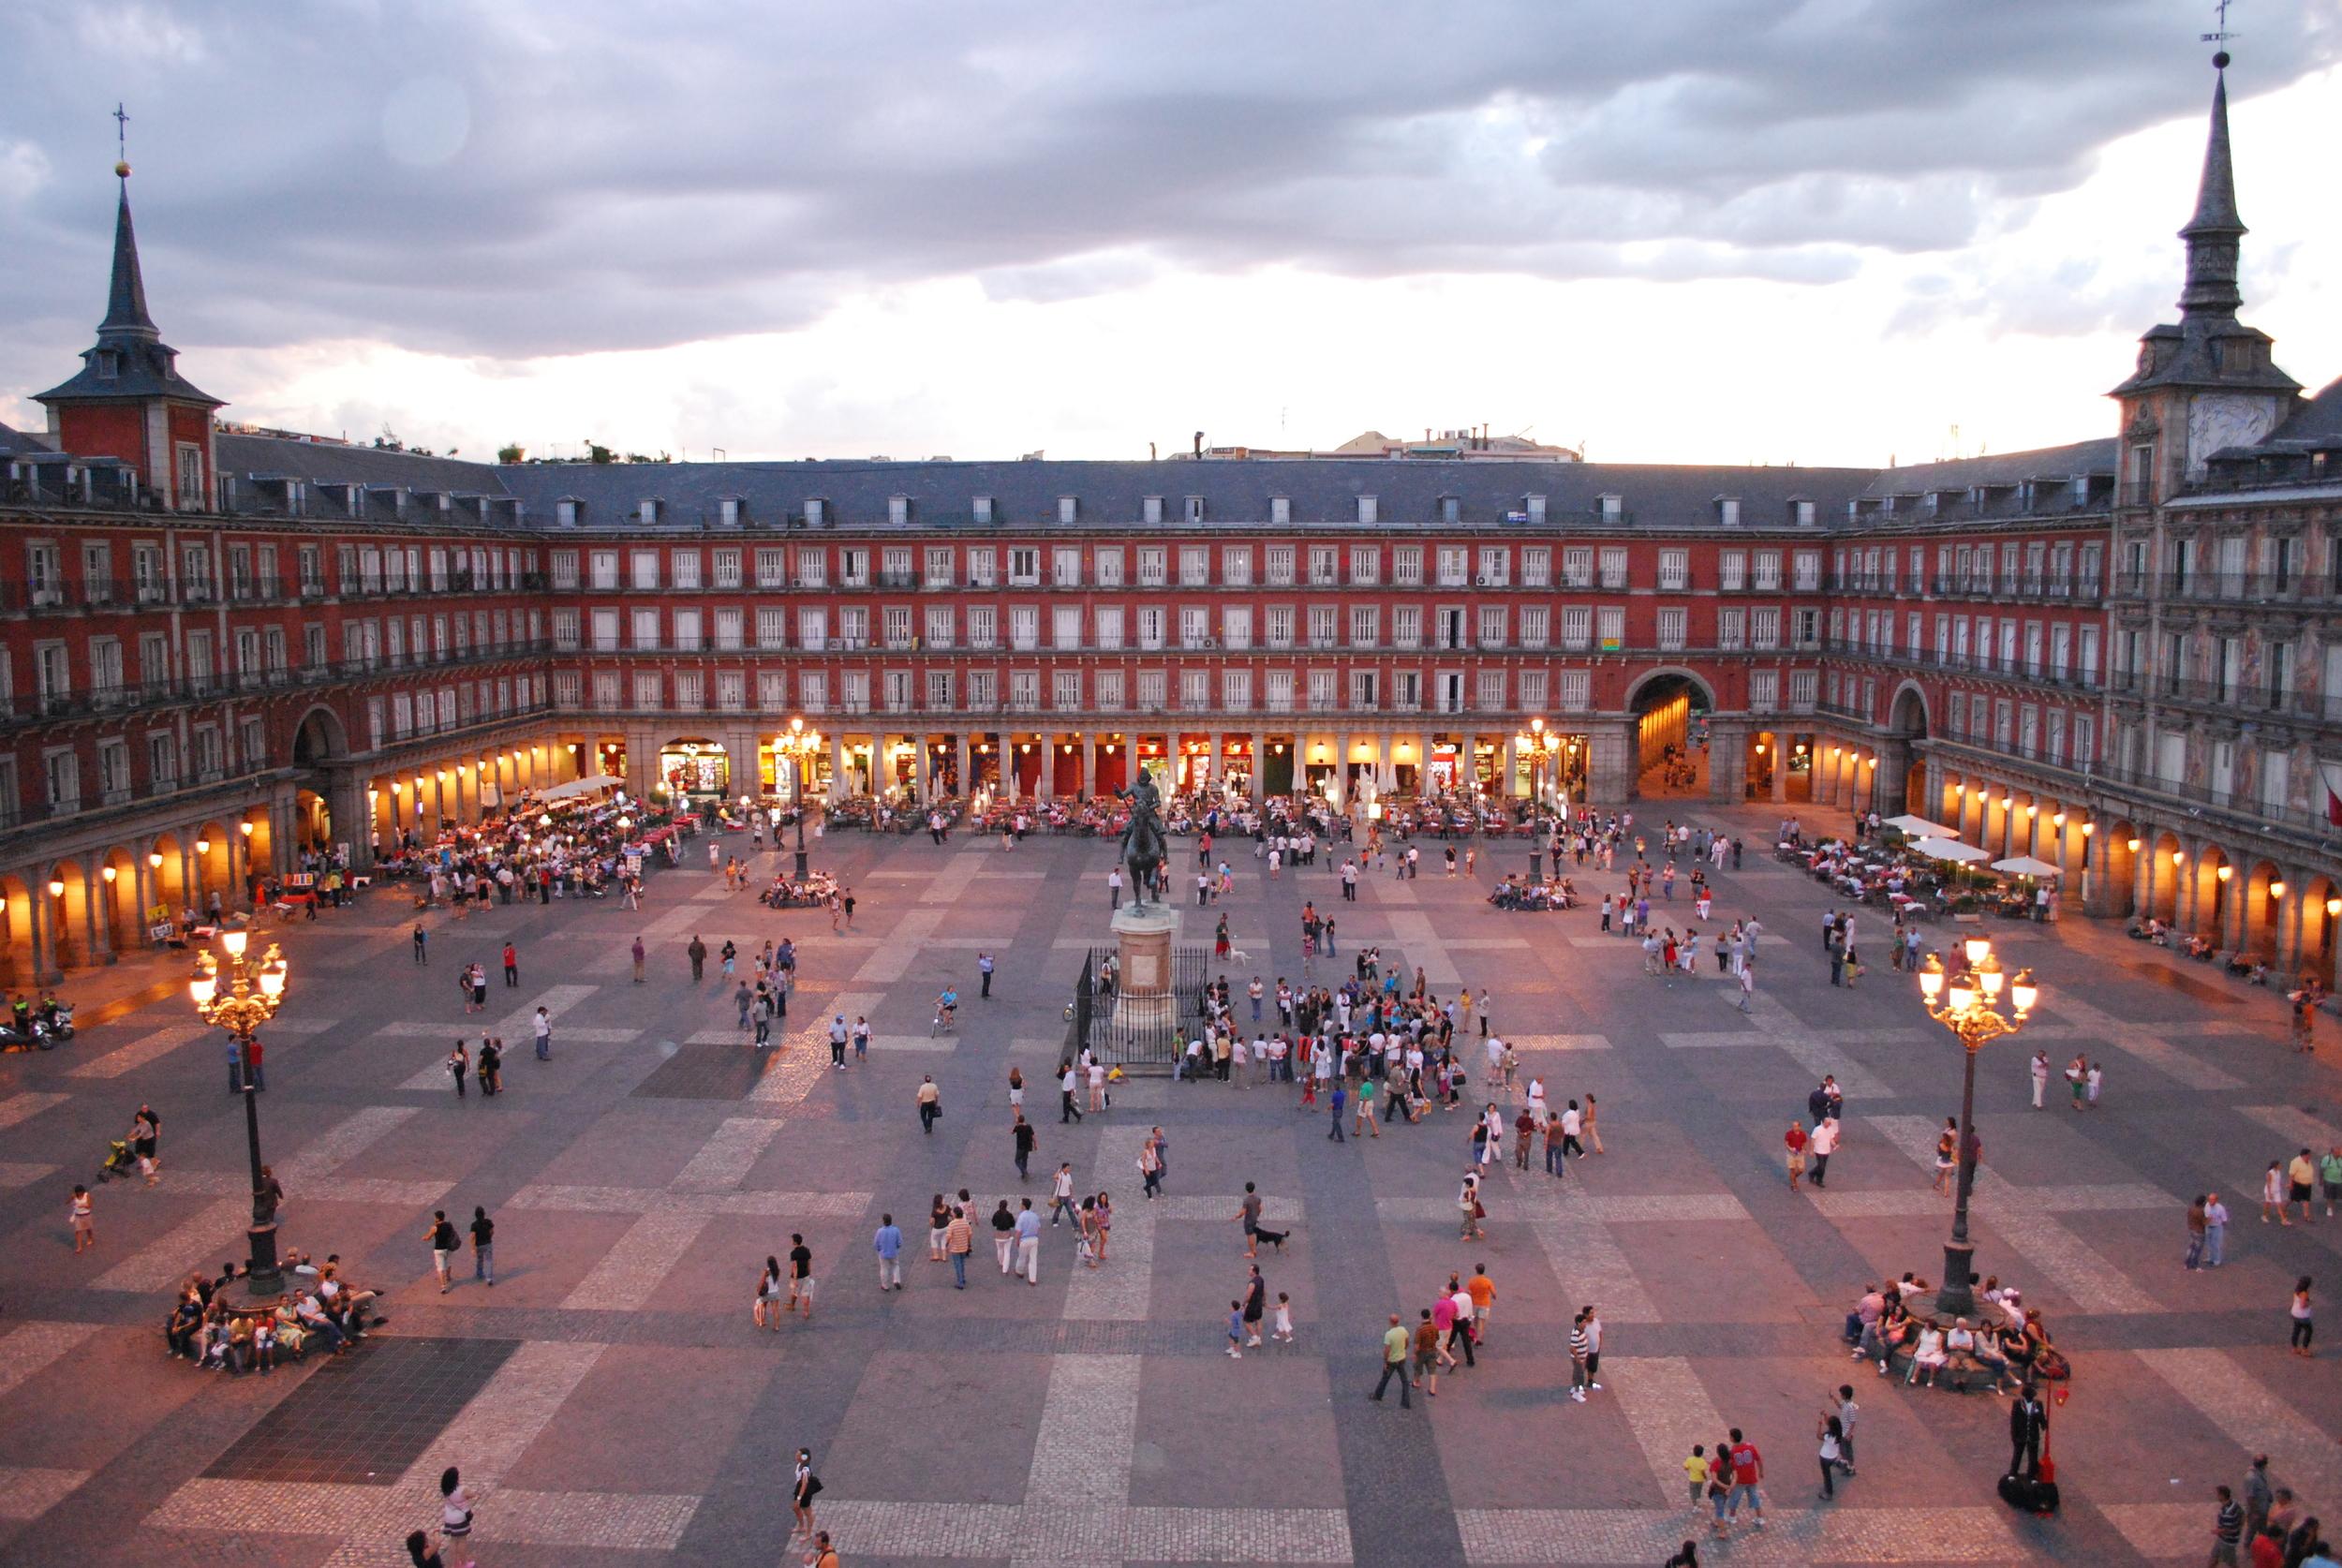 Plaza Mayor De Madrid, Spain (Source: Wikimedia Commons)